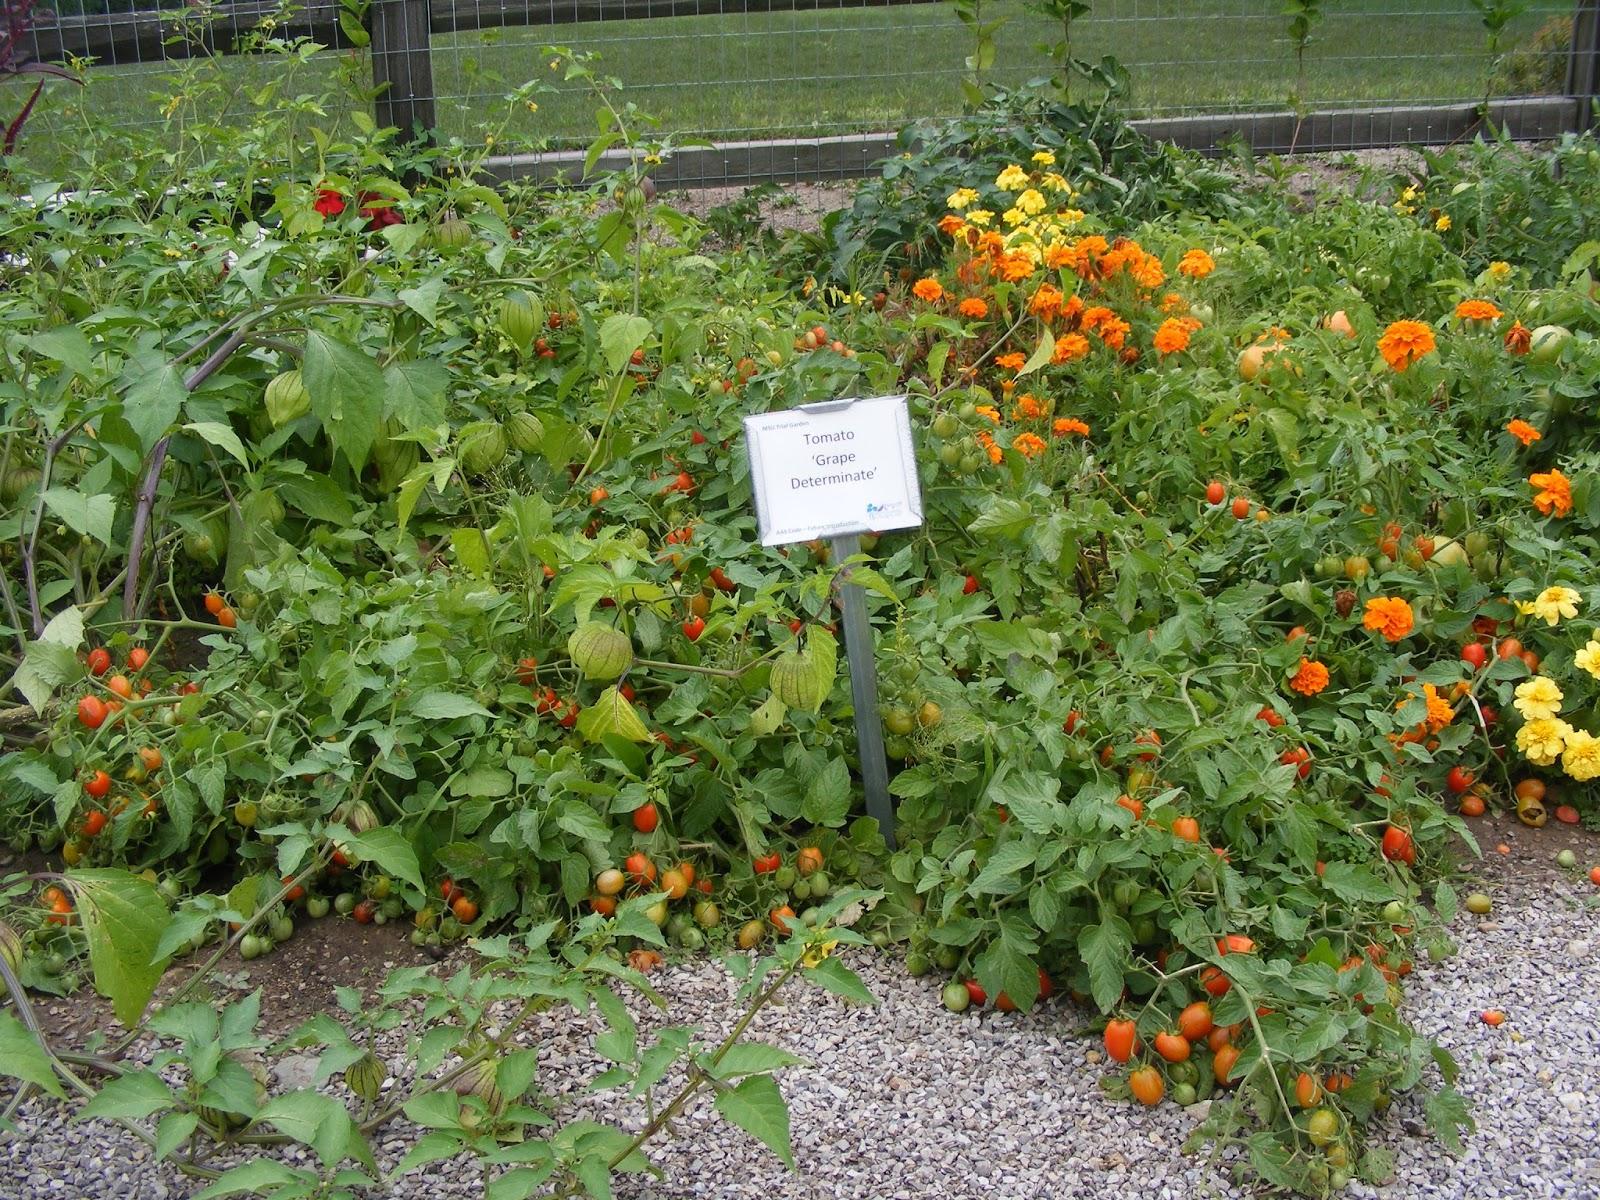 Flower Garden Eaton Rapids Michigan: Eaton Rapids Joe: August 2013